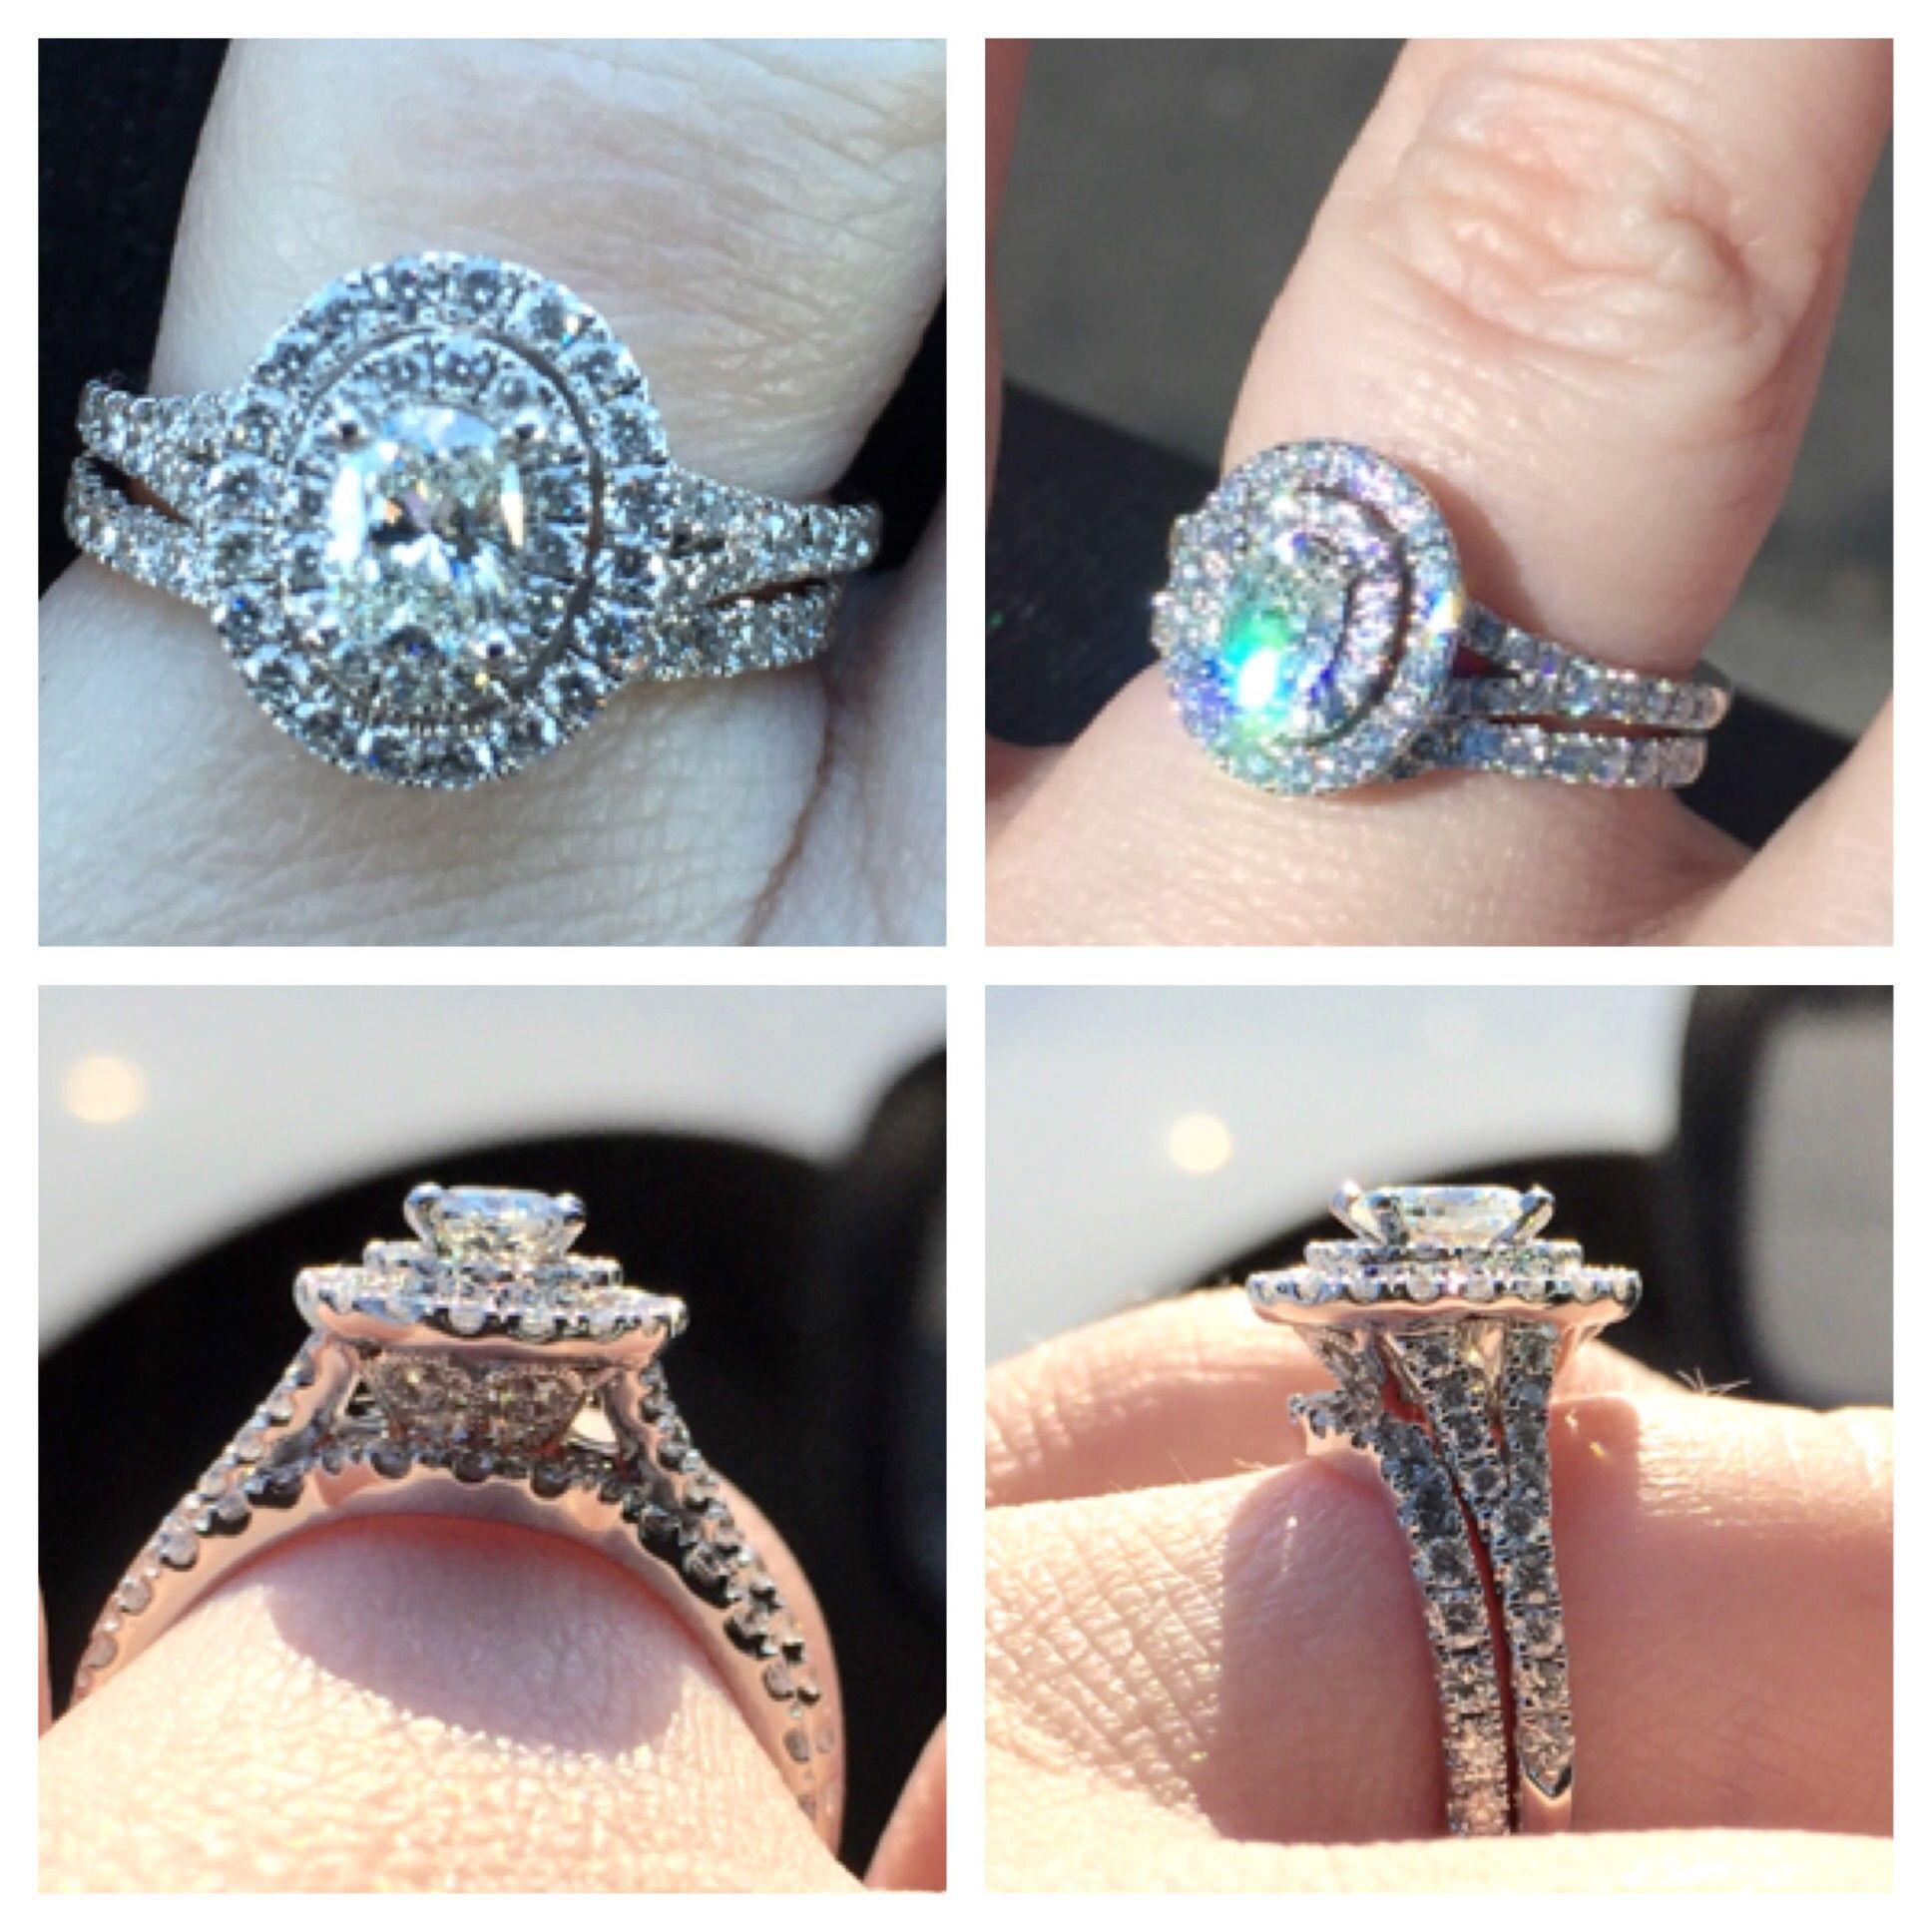 Show Me Your Oval Halo 039 S 8211 Moissy Amp Diamond Weddin Neil Lane Engagement Rings Engagement Rings Wedding Bands Set Engagement Wedding Ring Sets